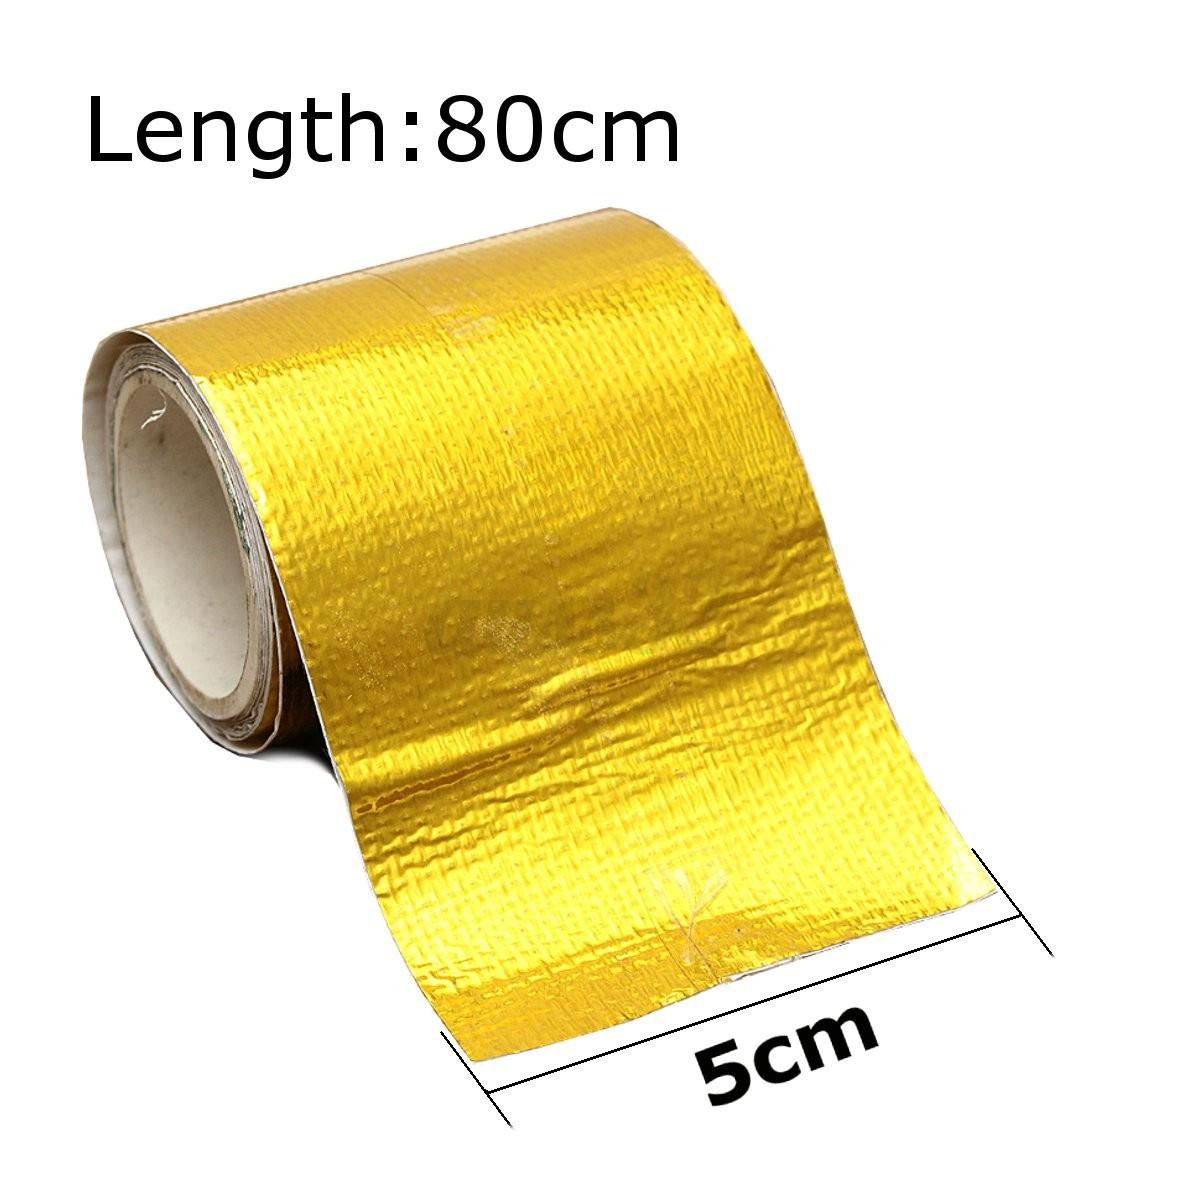 rouleau isolant thermique ruban bande tuyau d echappement adh sif tape wrap ebay. Black Bedroom Furniture Sets. Home Design Ideas